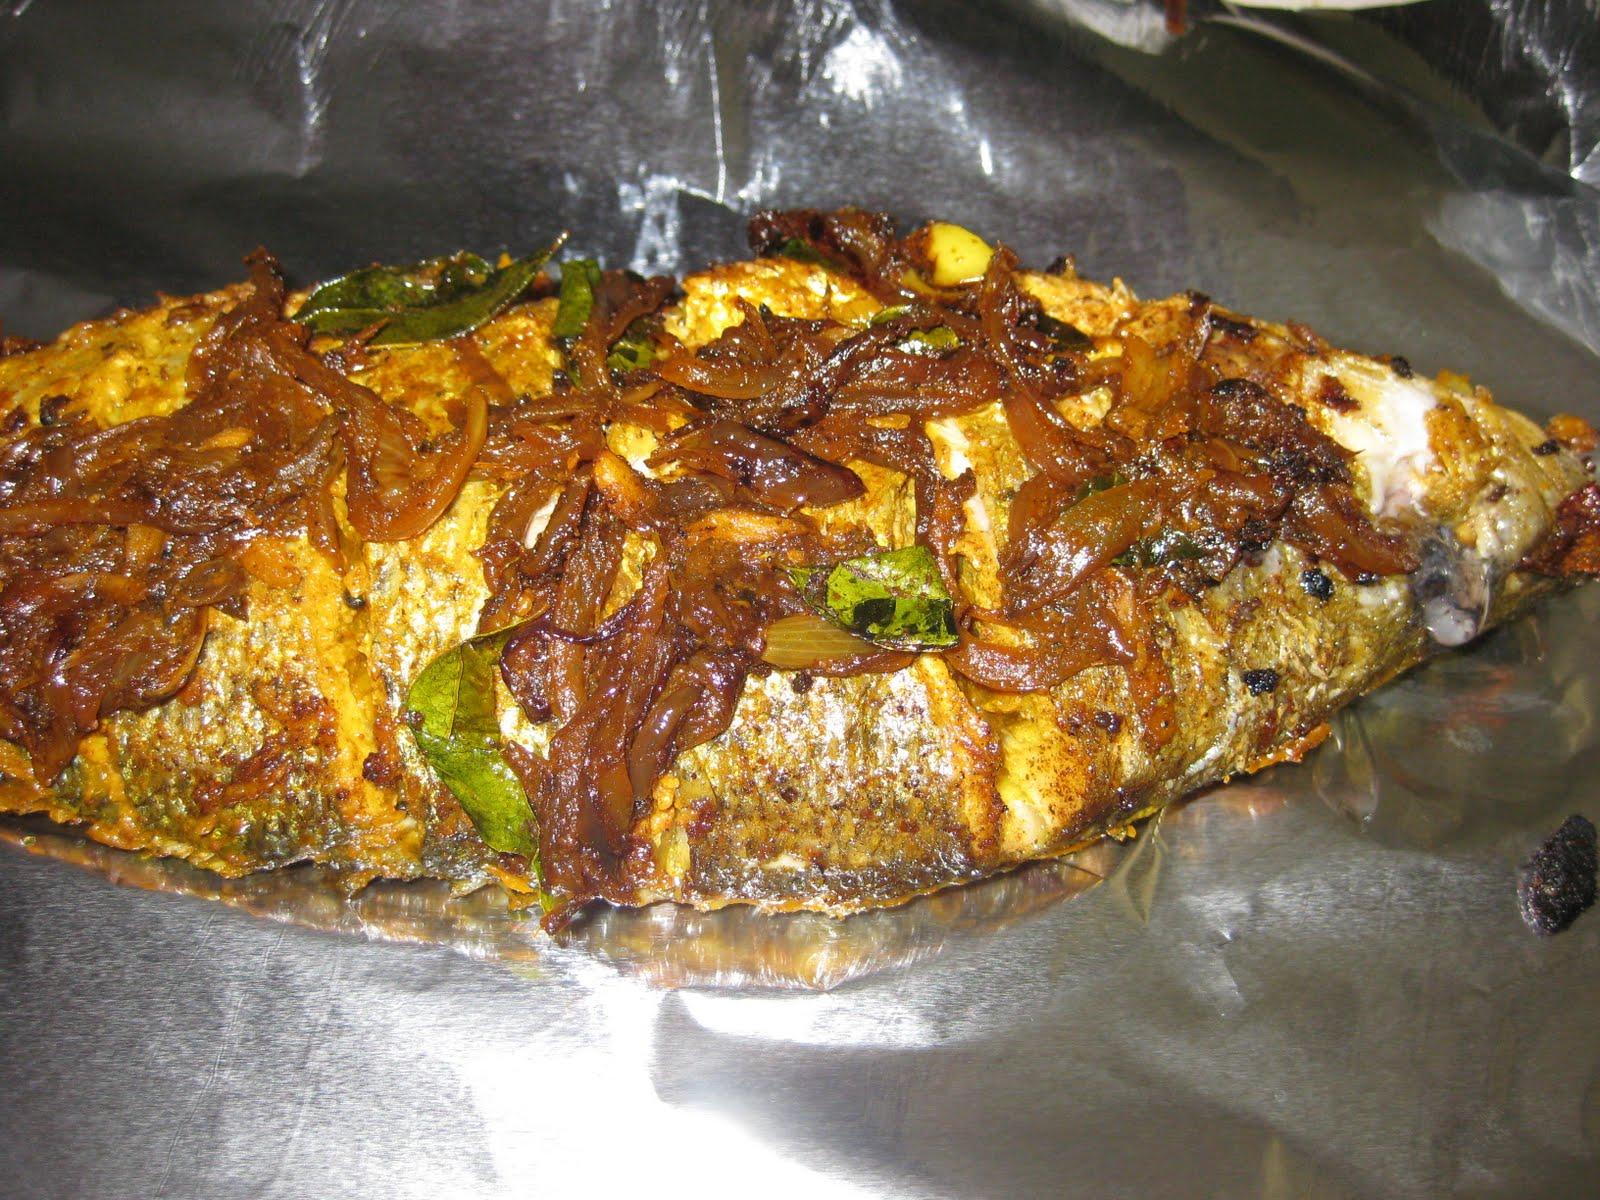 ... salt baked potato salt baked fish stuffed with herbs and lemon recipes